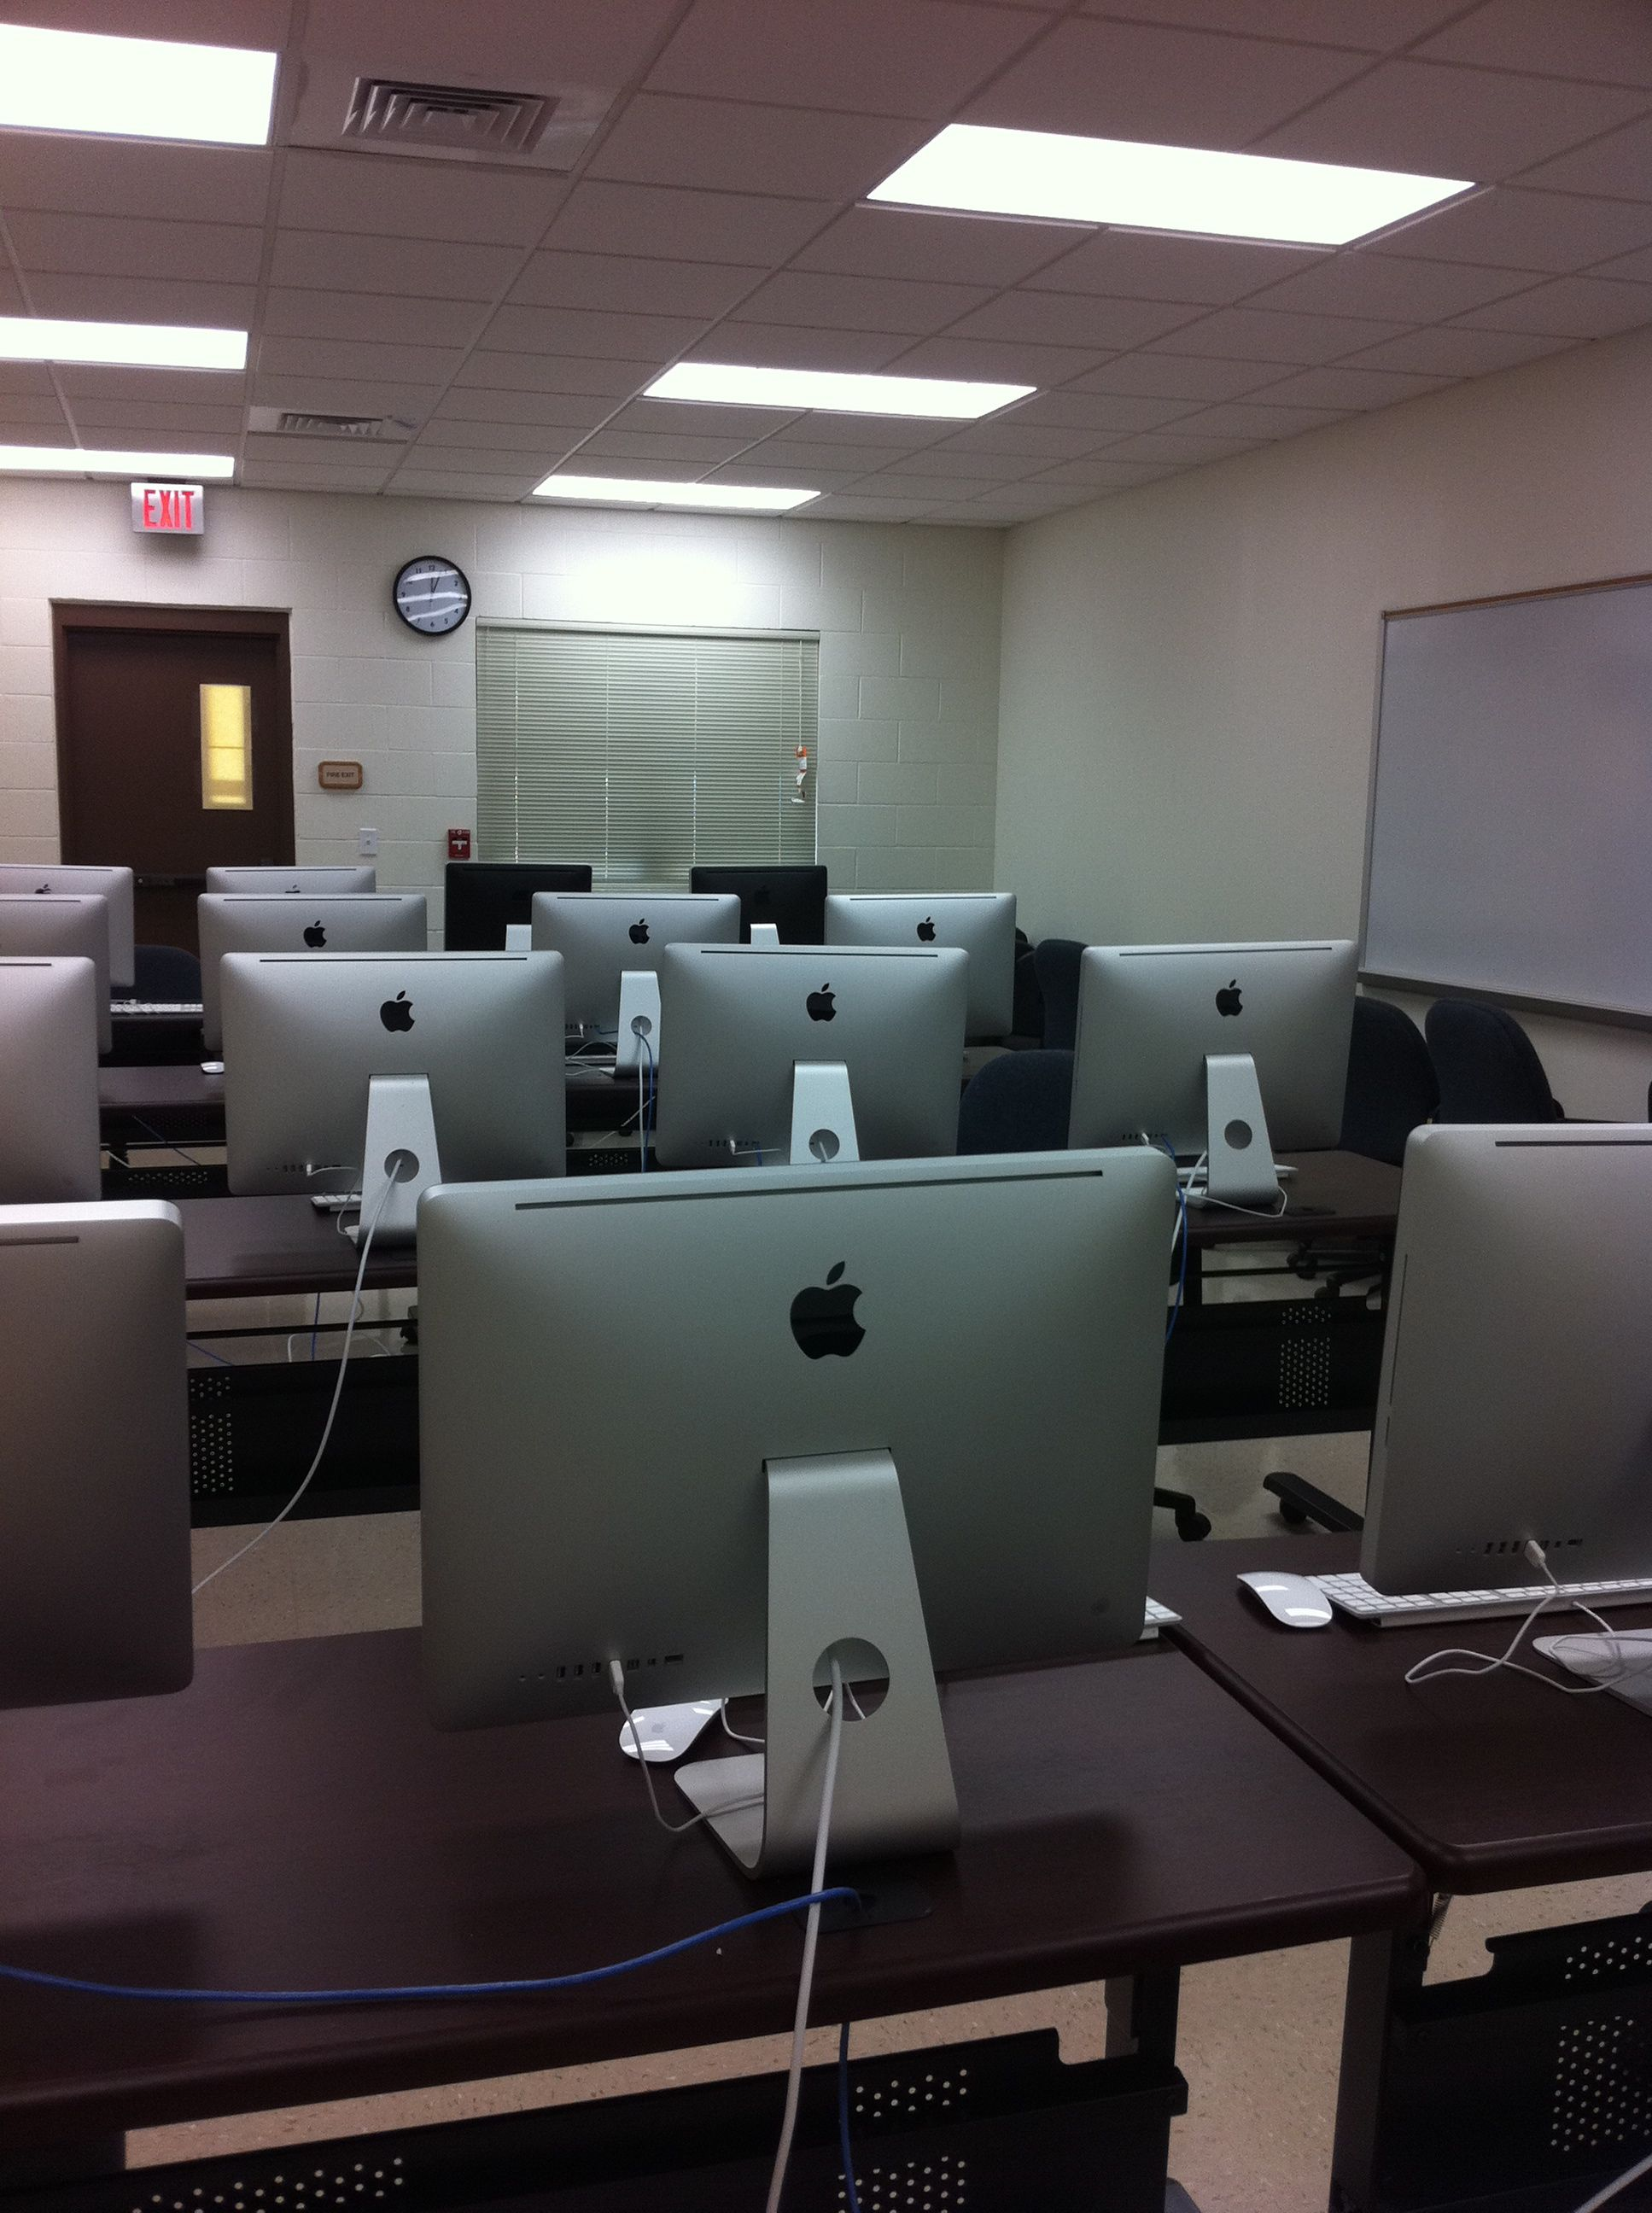 Laboratory Room Design: Computer Lab At Kauai Community College Office Of